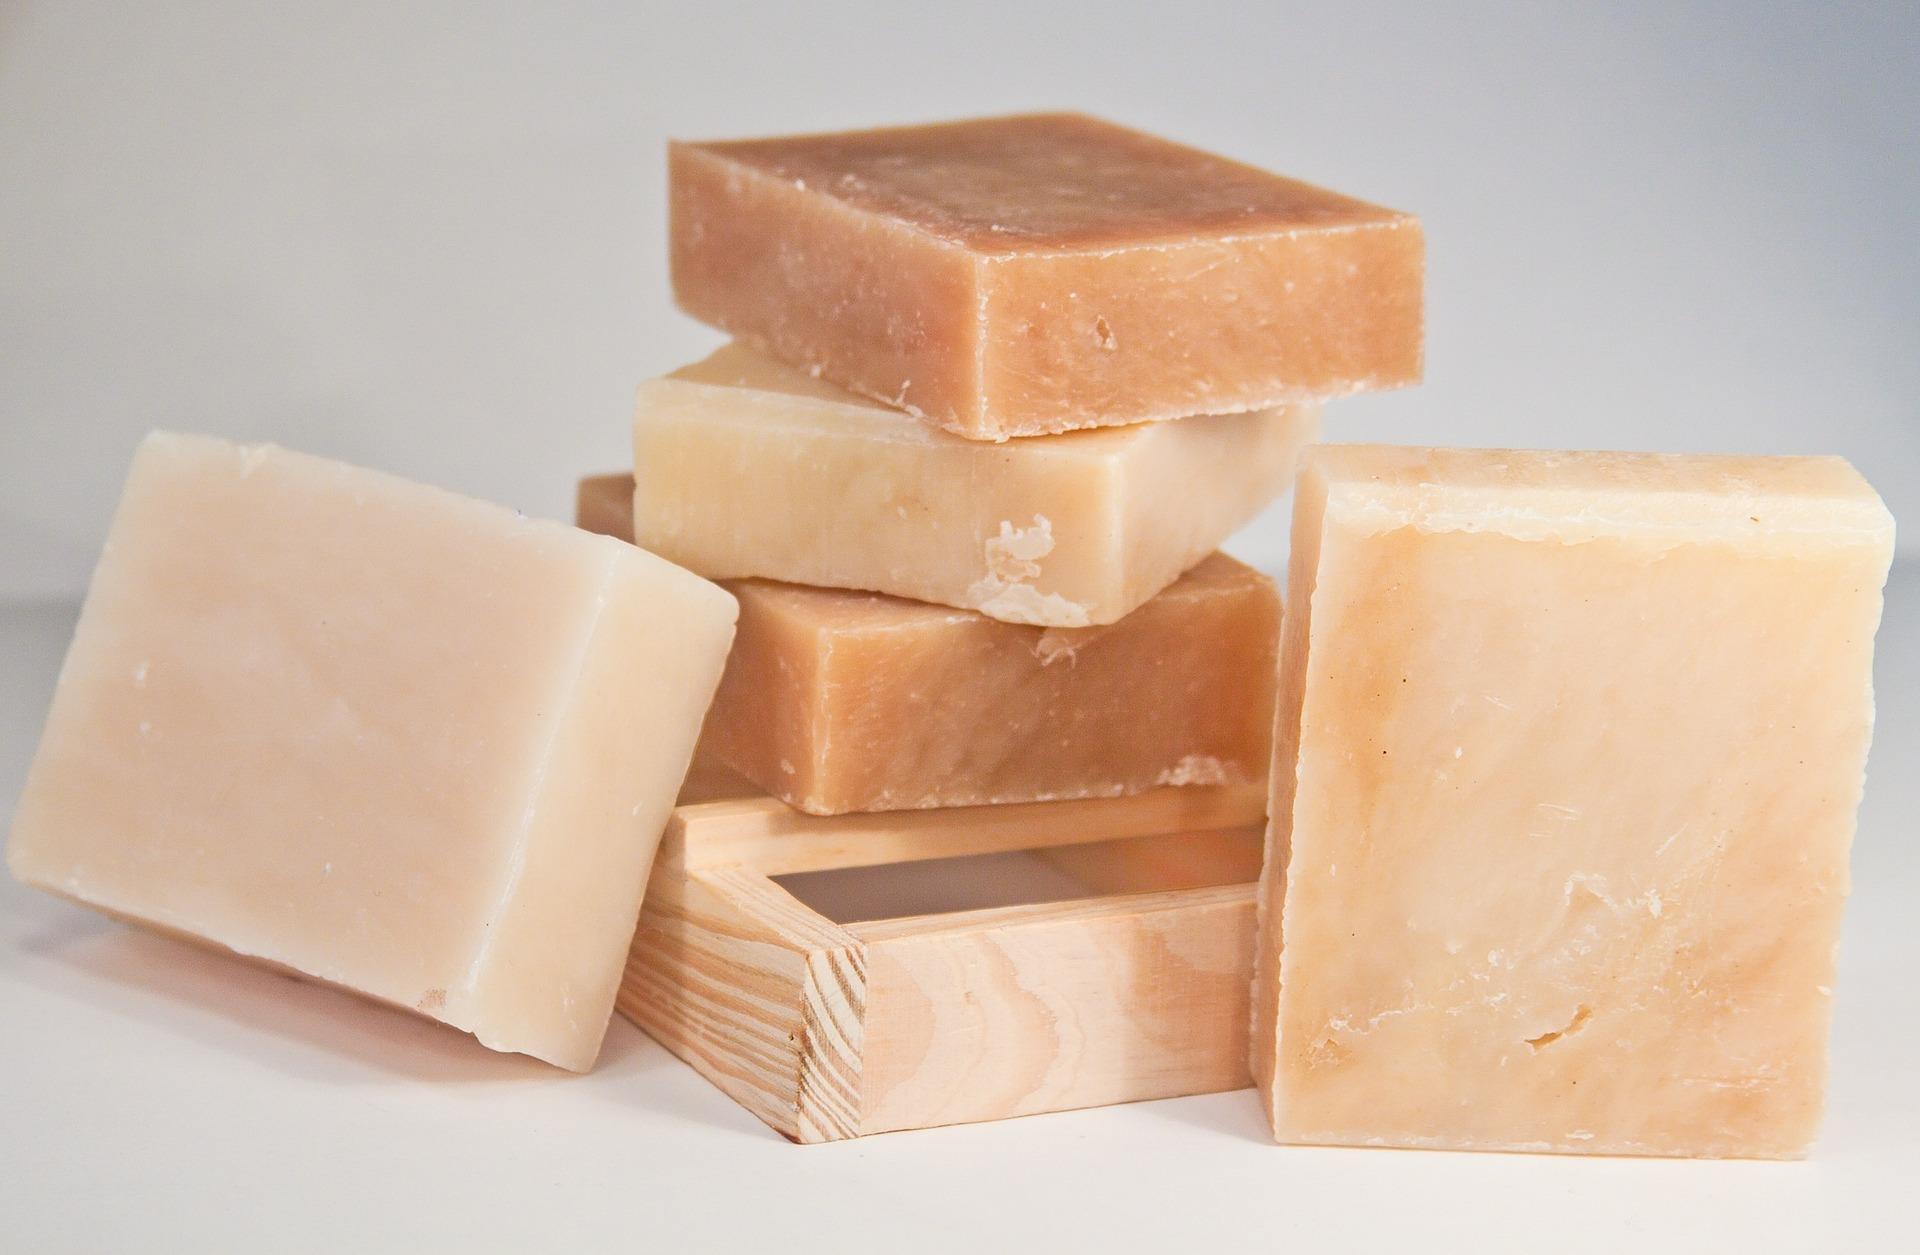 soap-1509963_1920.jpg